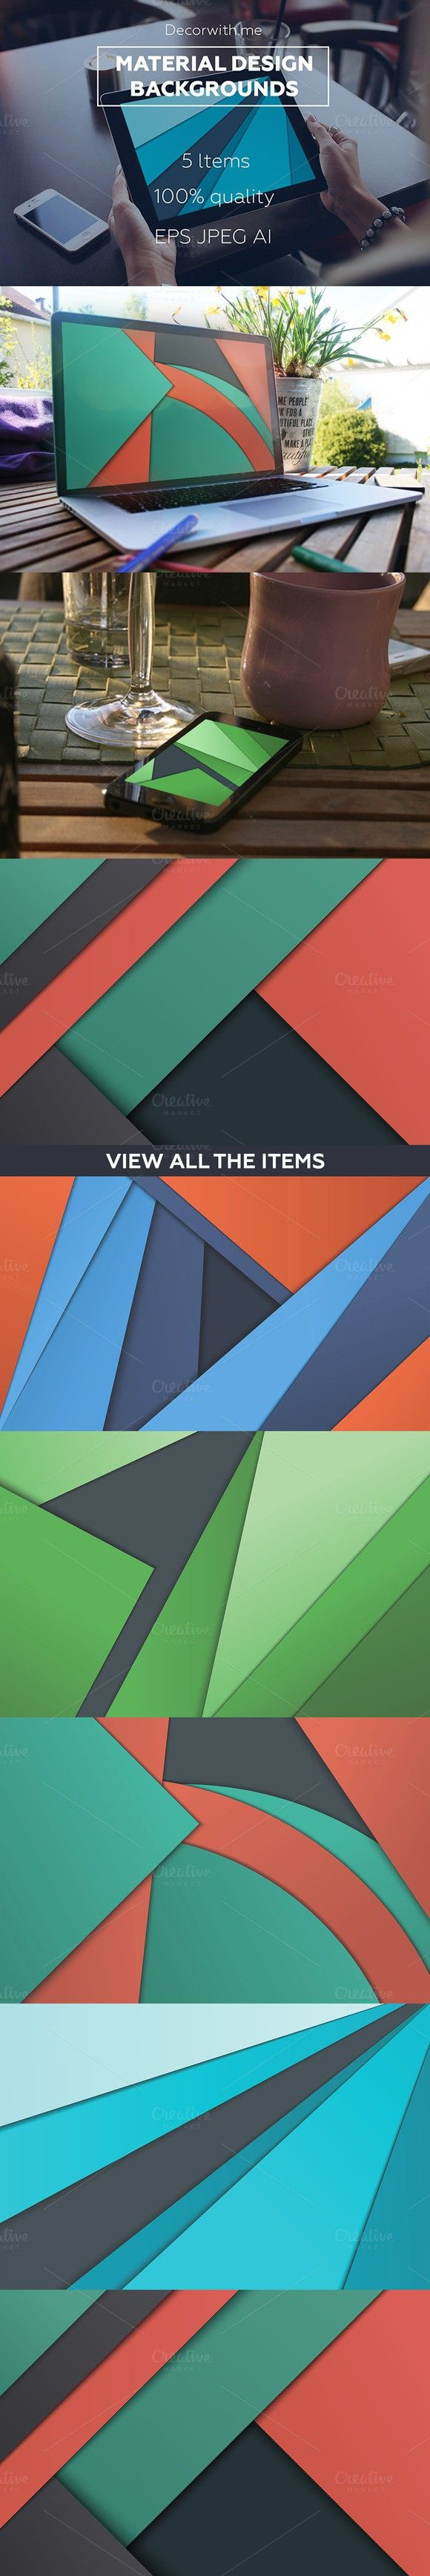 Material Design Backgrounds Set. Textures. $10.00